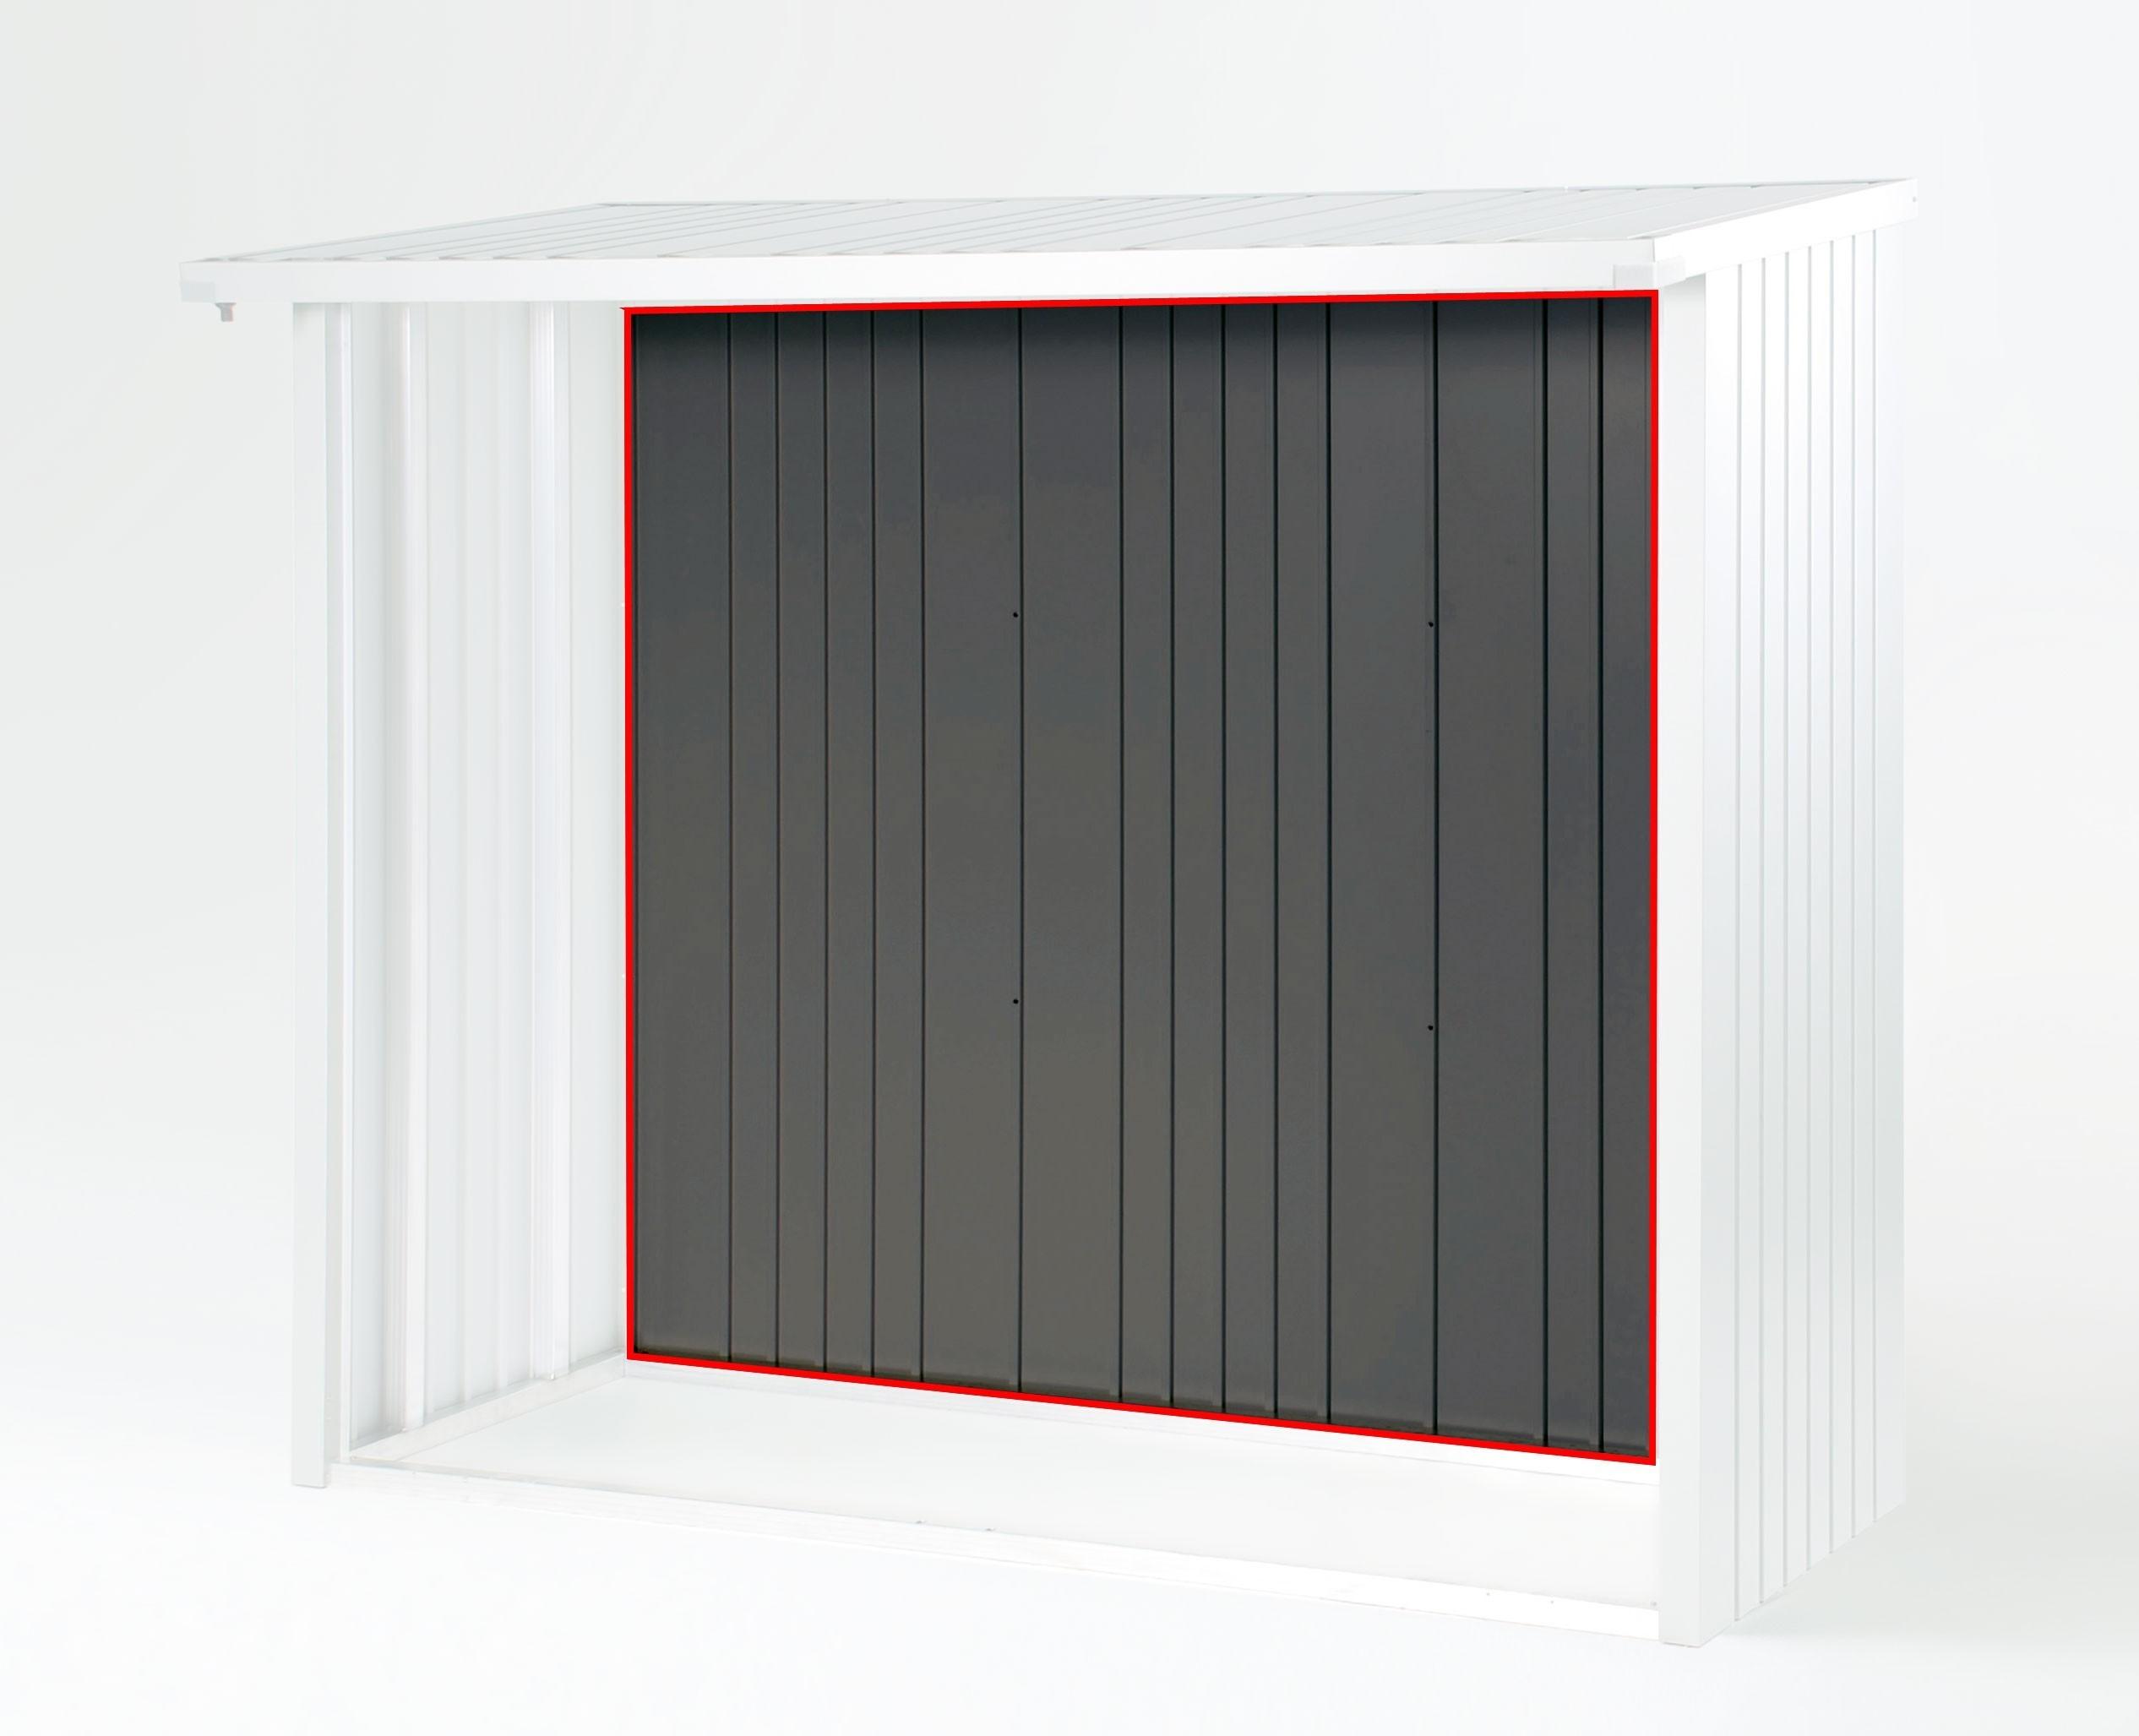 r ckwand biohort kaminholzregal ger teschrank woodstock 230 quarzgrau bei. Black Bedroom Furniture Sets. Home Design Ideas